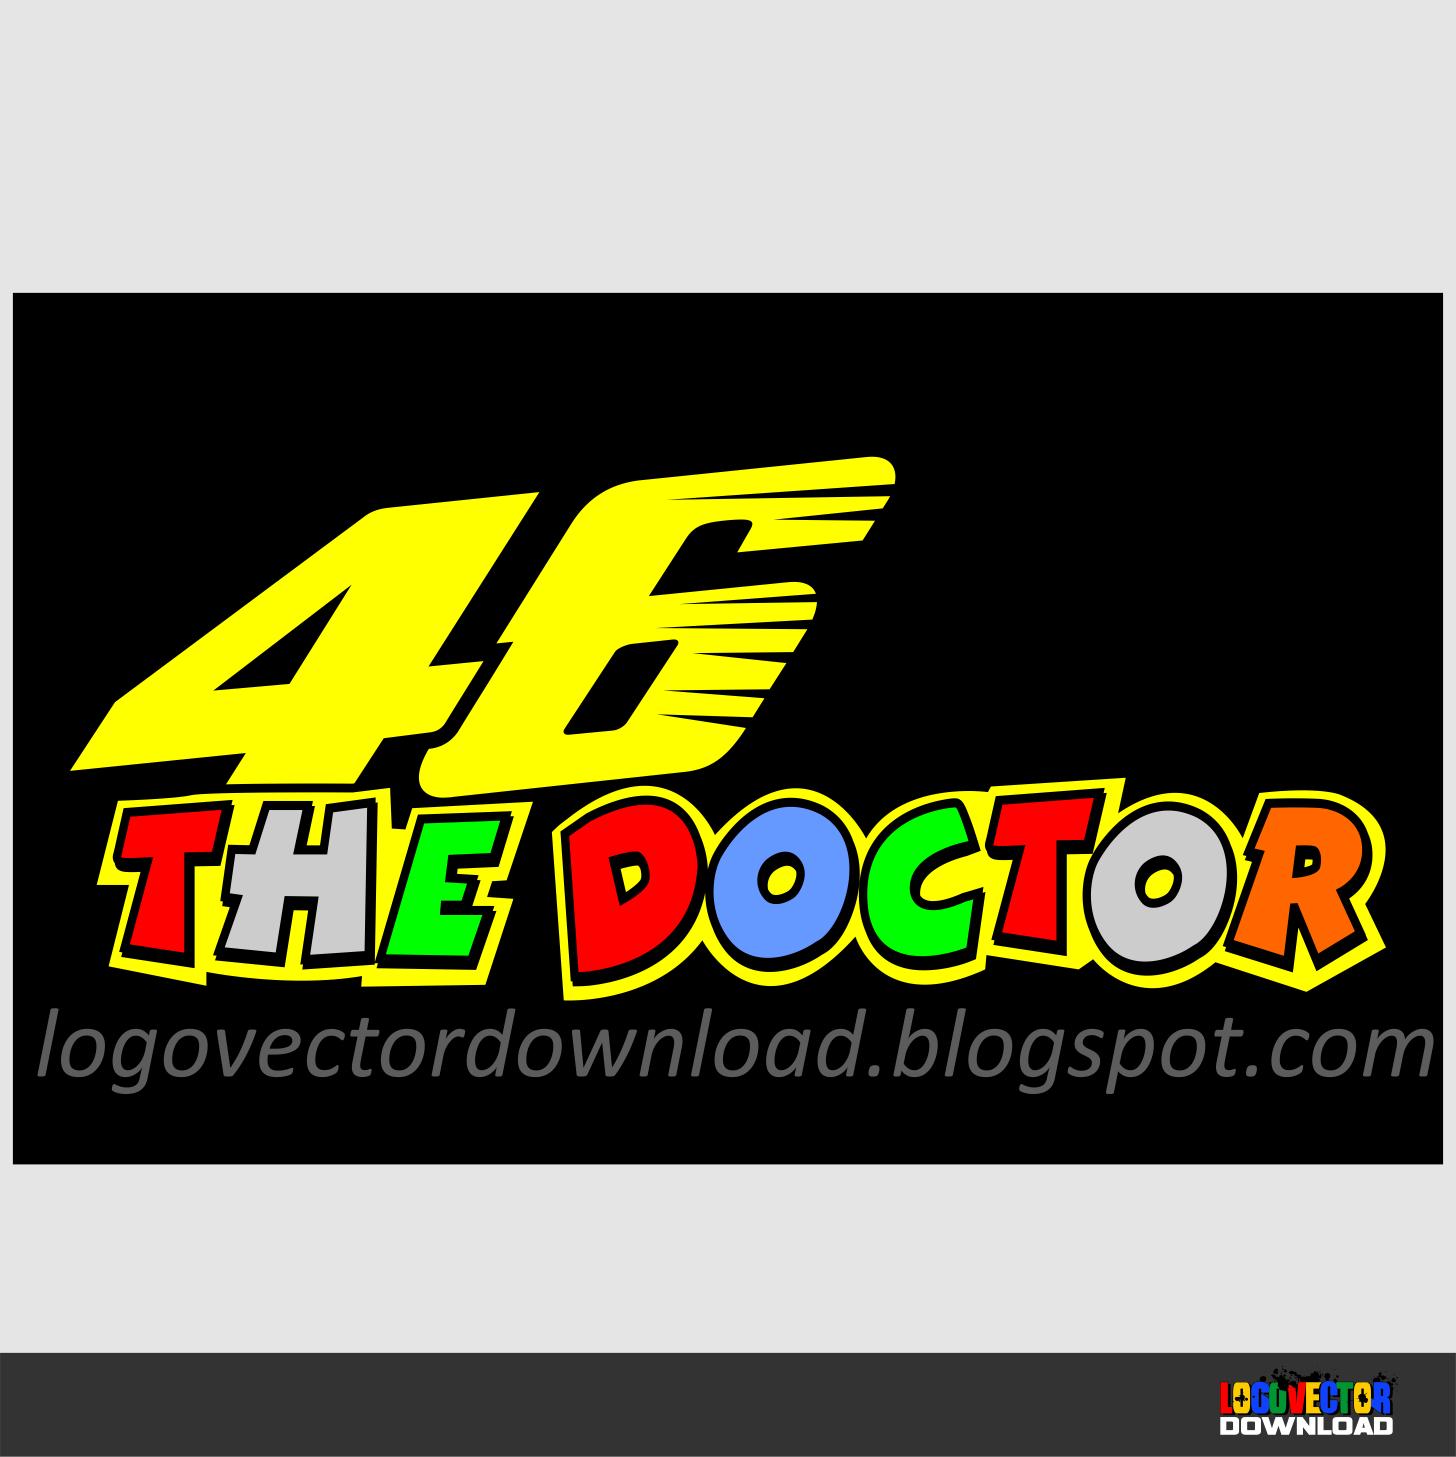 46 the doctor logo vector cdr download logo vector download